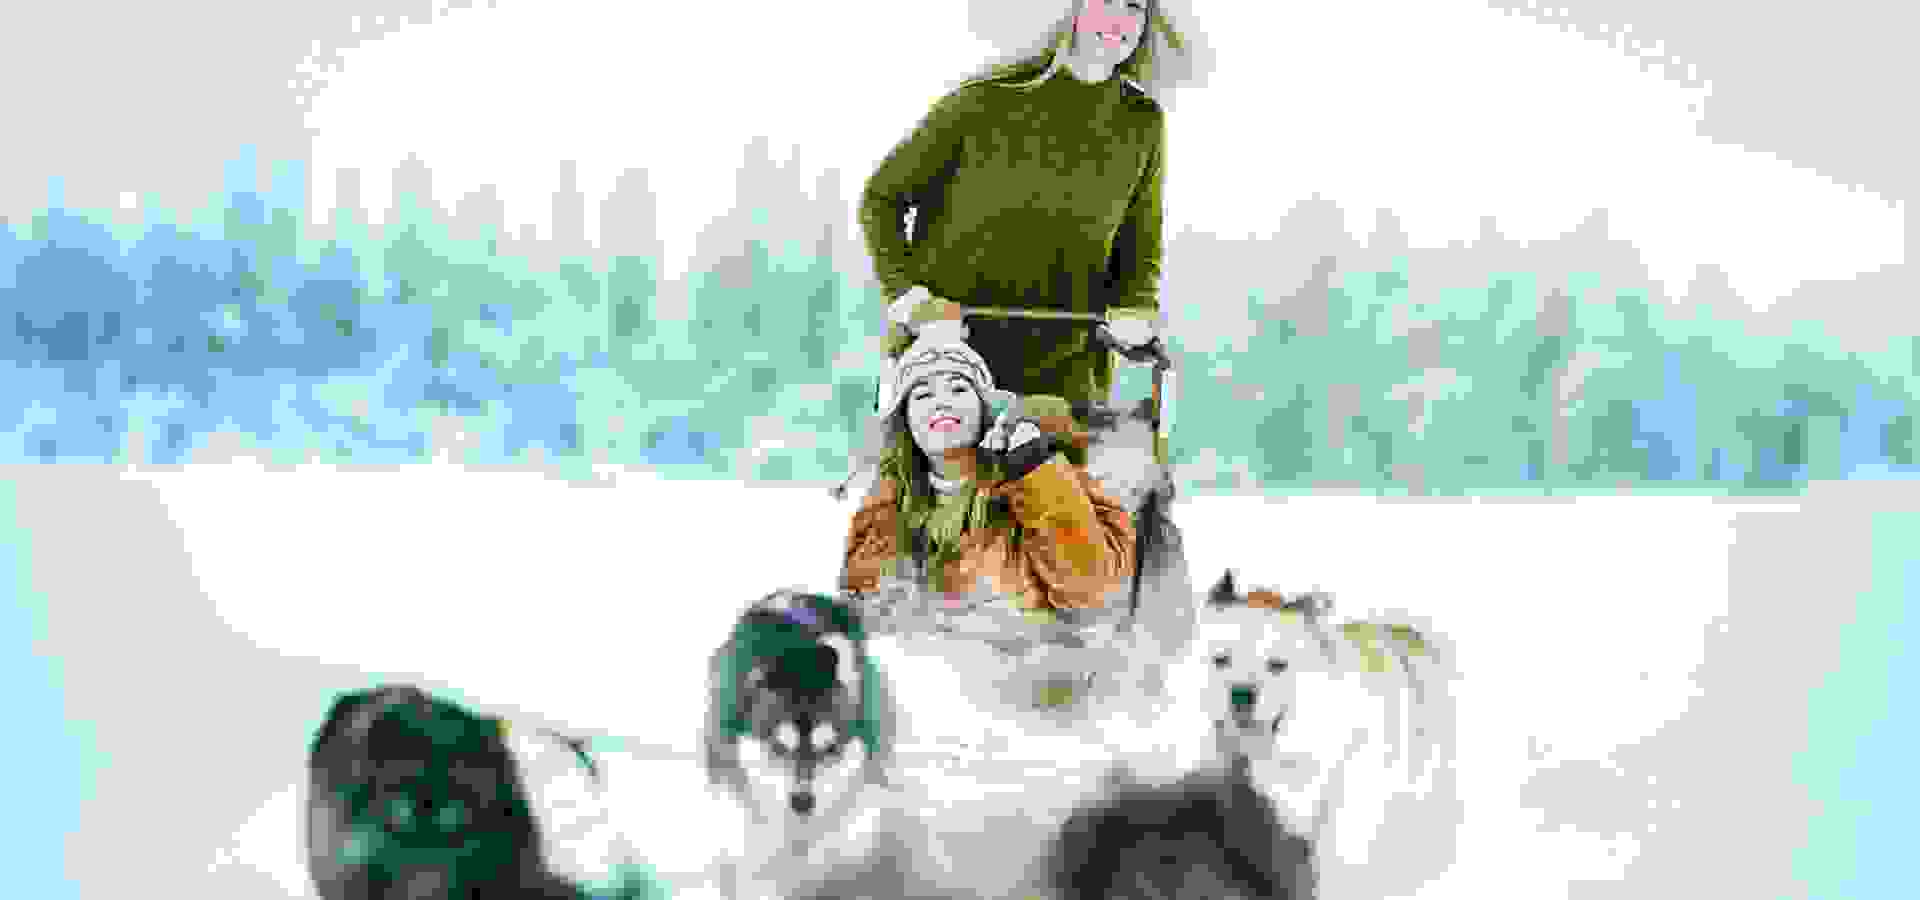 dog sledding, hundspann, andy anderson, 1920 x 1080